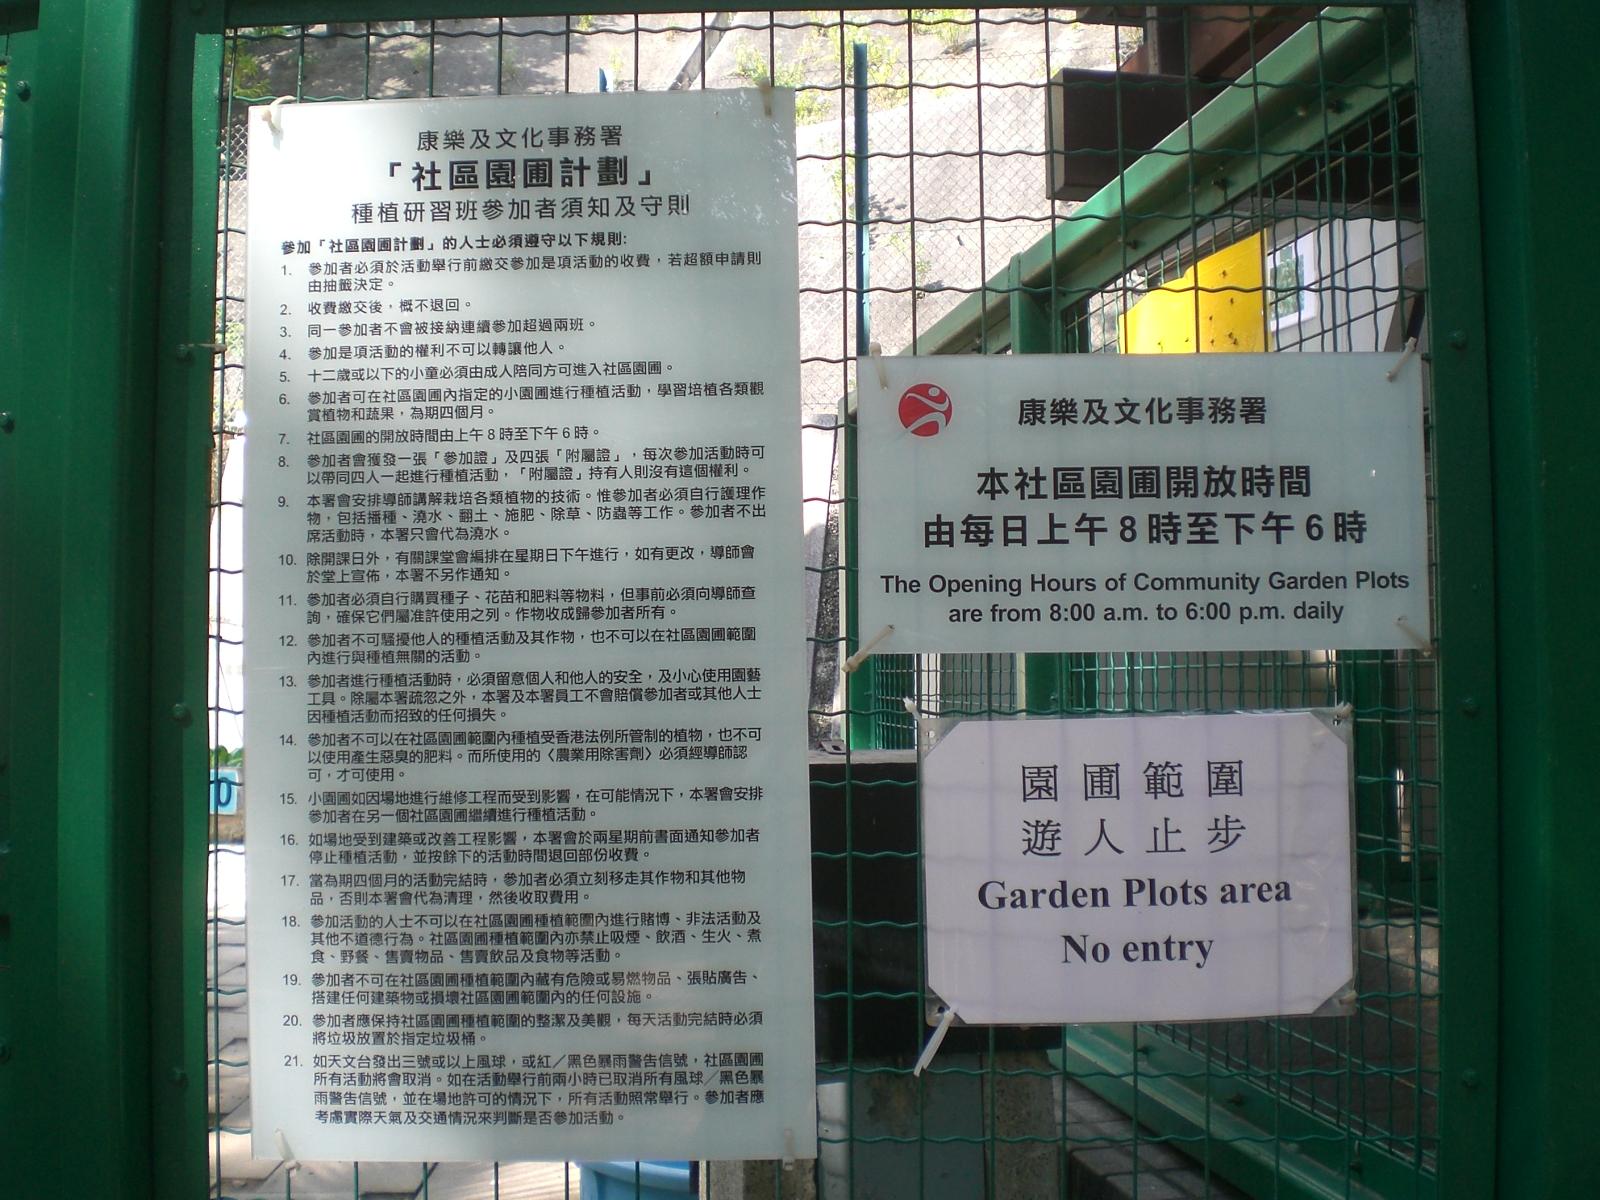 File:HK Sunday Wan Chai Park Gardening Rules 1 JPG